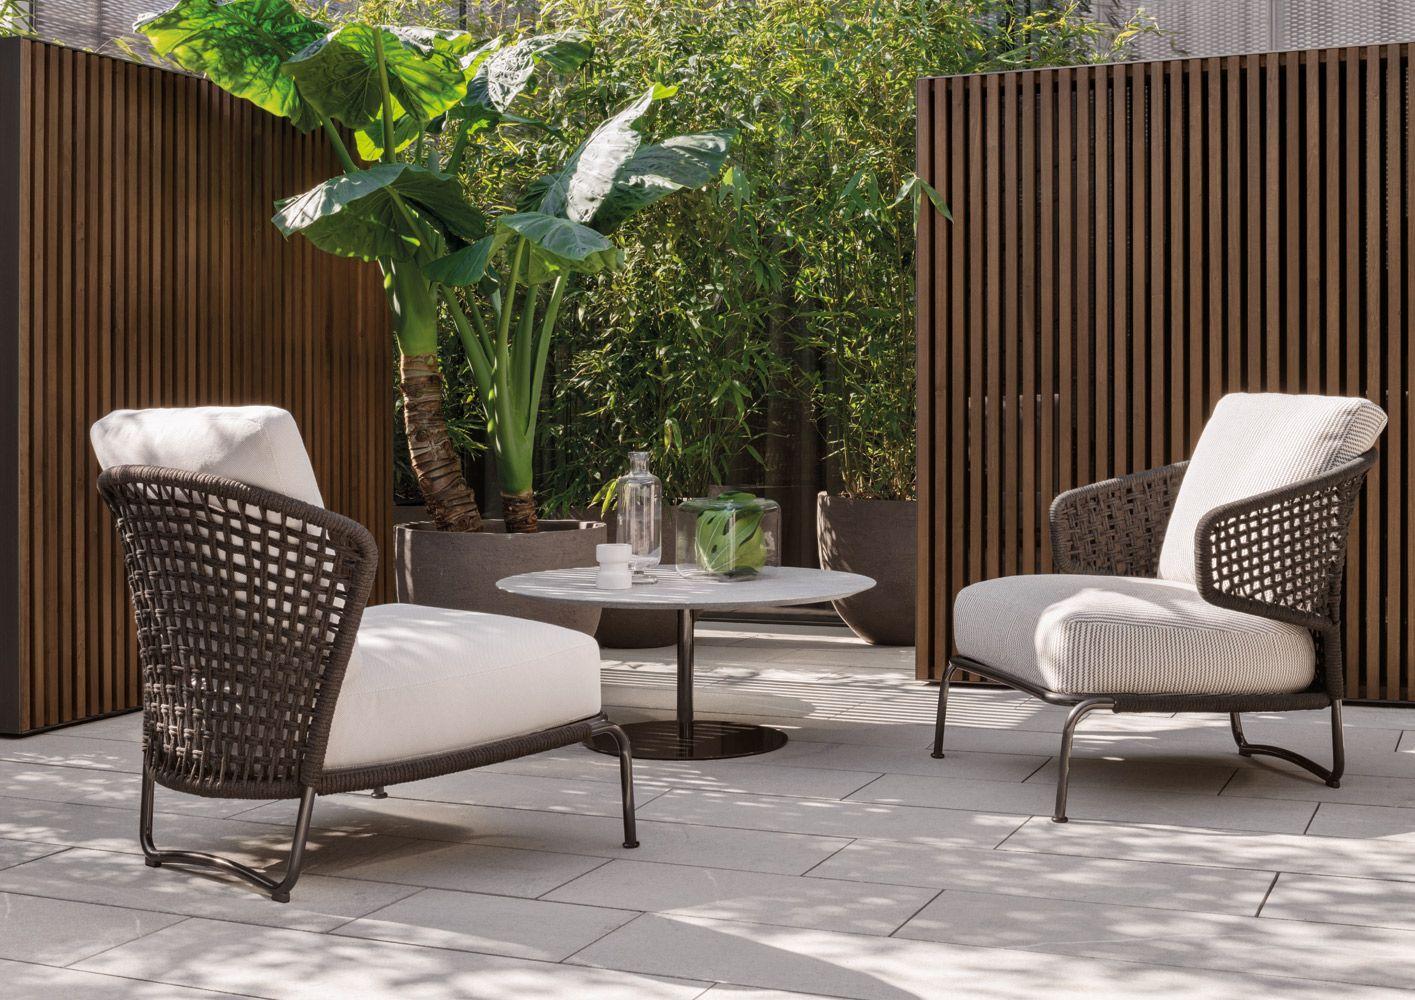 Minotti Aston Cord Outdoor Furniture Furniture Modern Fence Design [ 1000 x 1415 Pixel ]